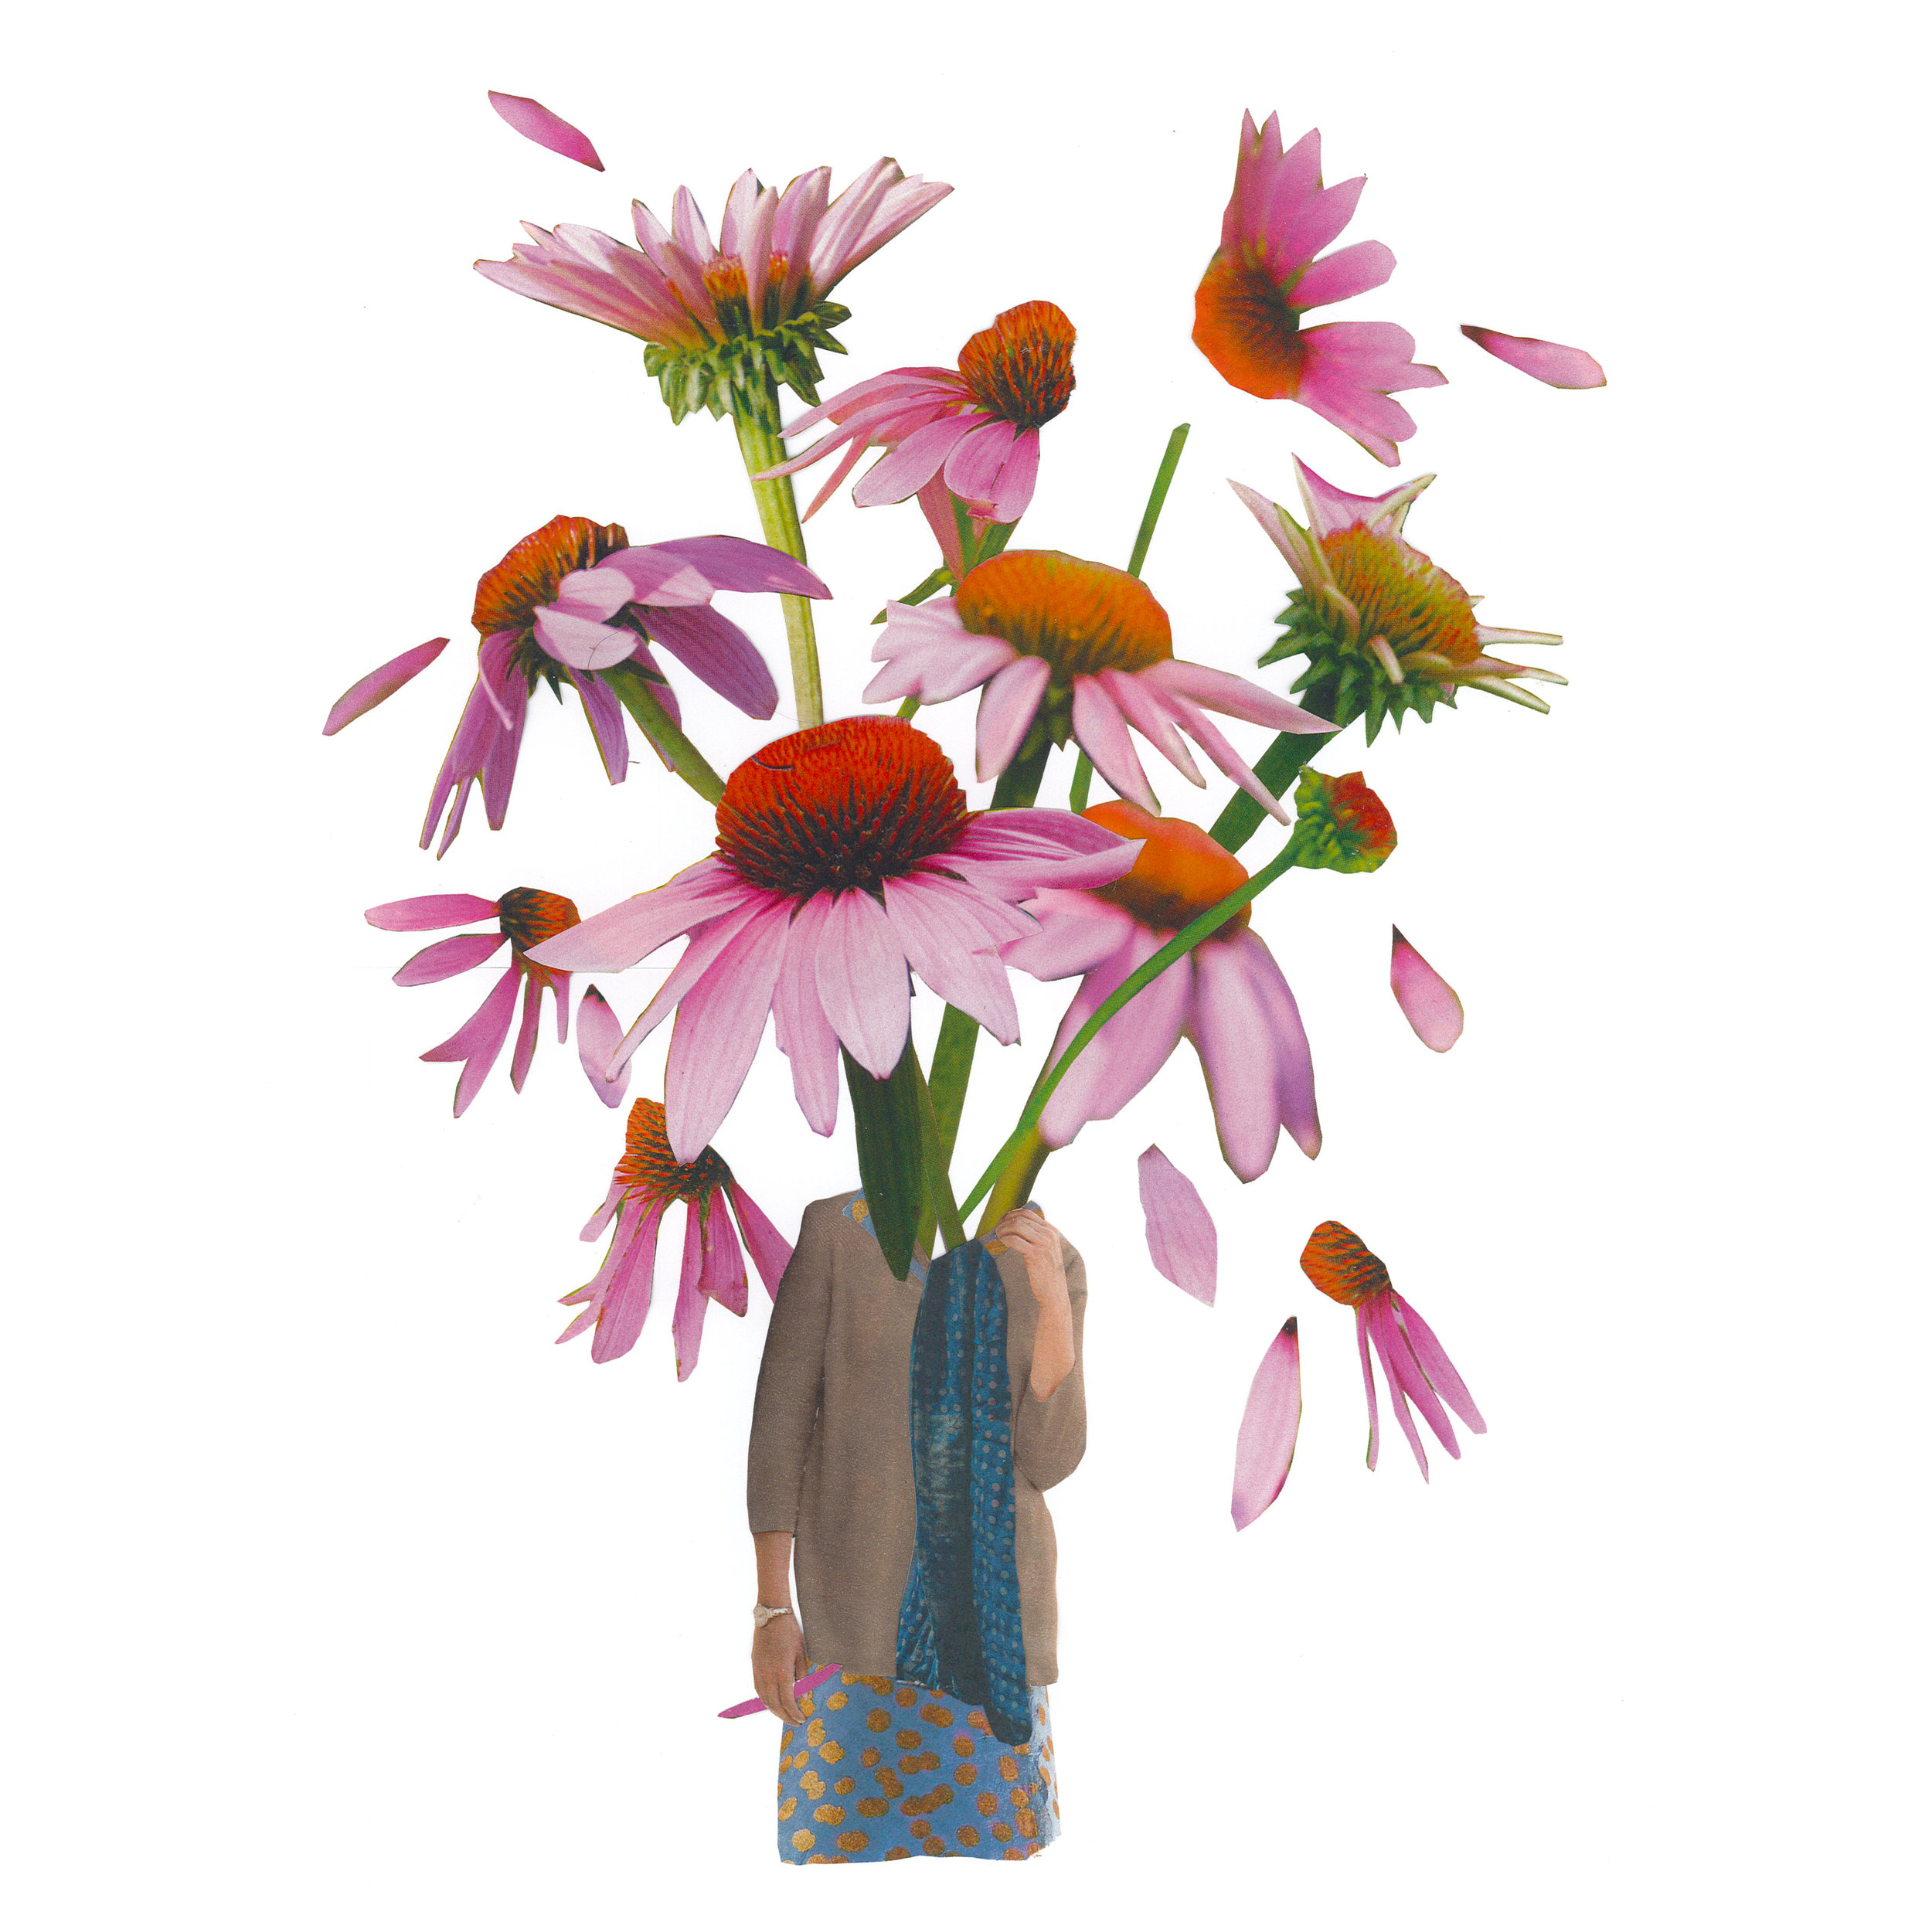 pink coneflower 11x11.jpg